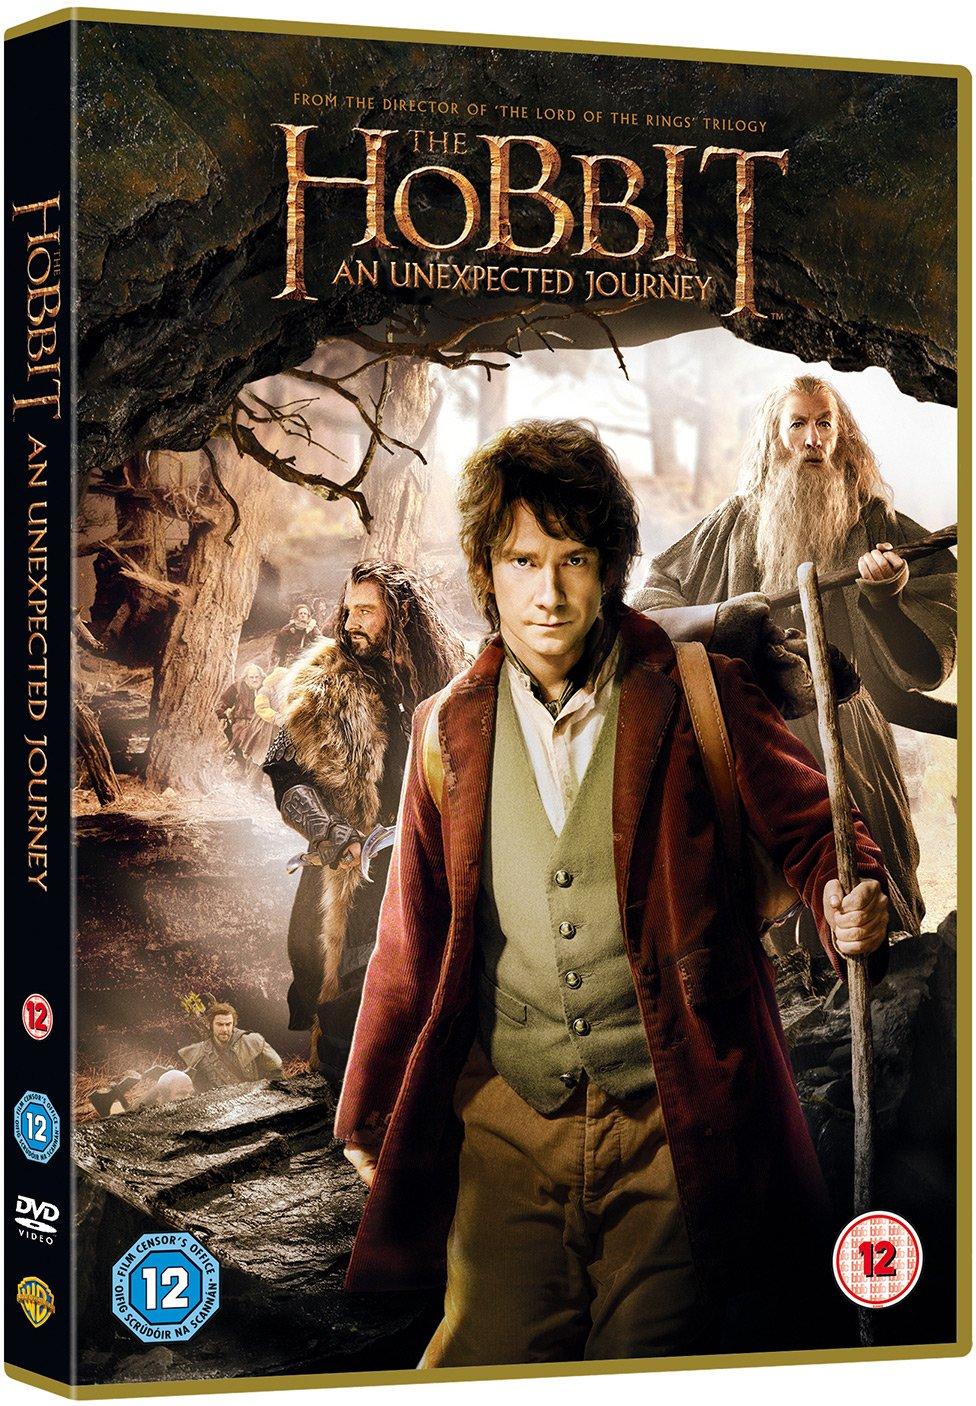 The Hobbit: An Unexpected Journey DVD + UV Copy 2013: Amazon.co.uk: Hugo  Weaving, Martin Freeman, Ian McKellen, Cate Blanchett, Richard Armitage, ...